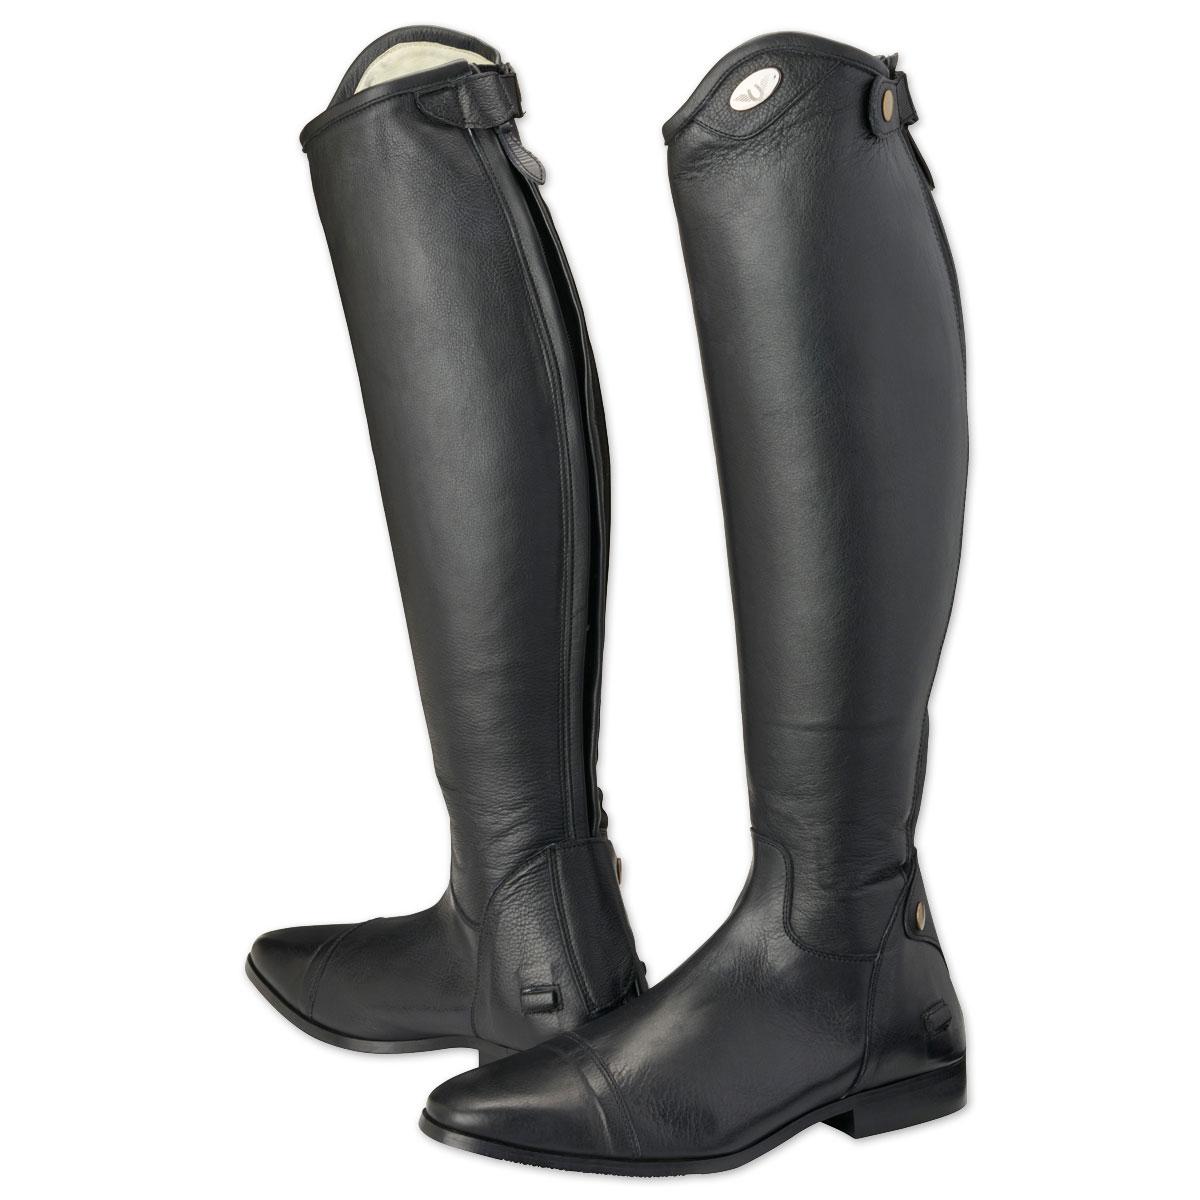 Tuff Rider Men's Wellesley Tall Boots